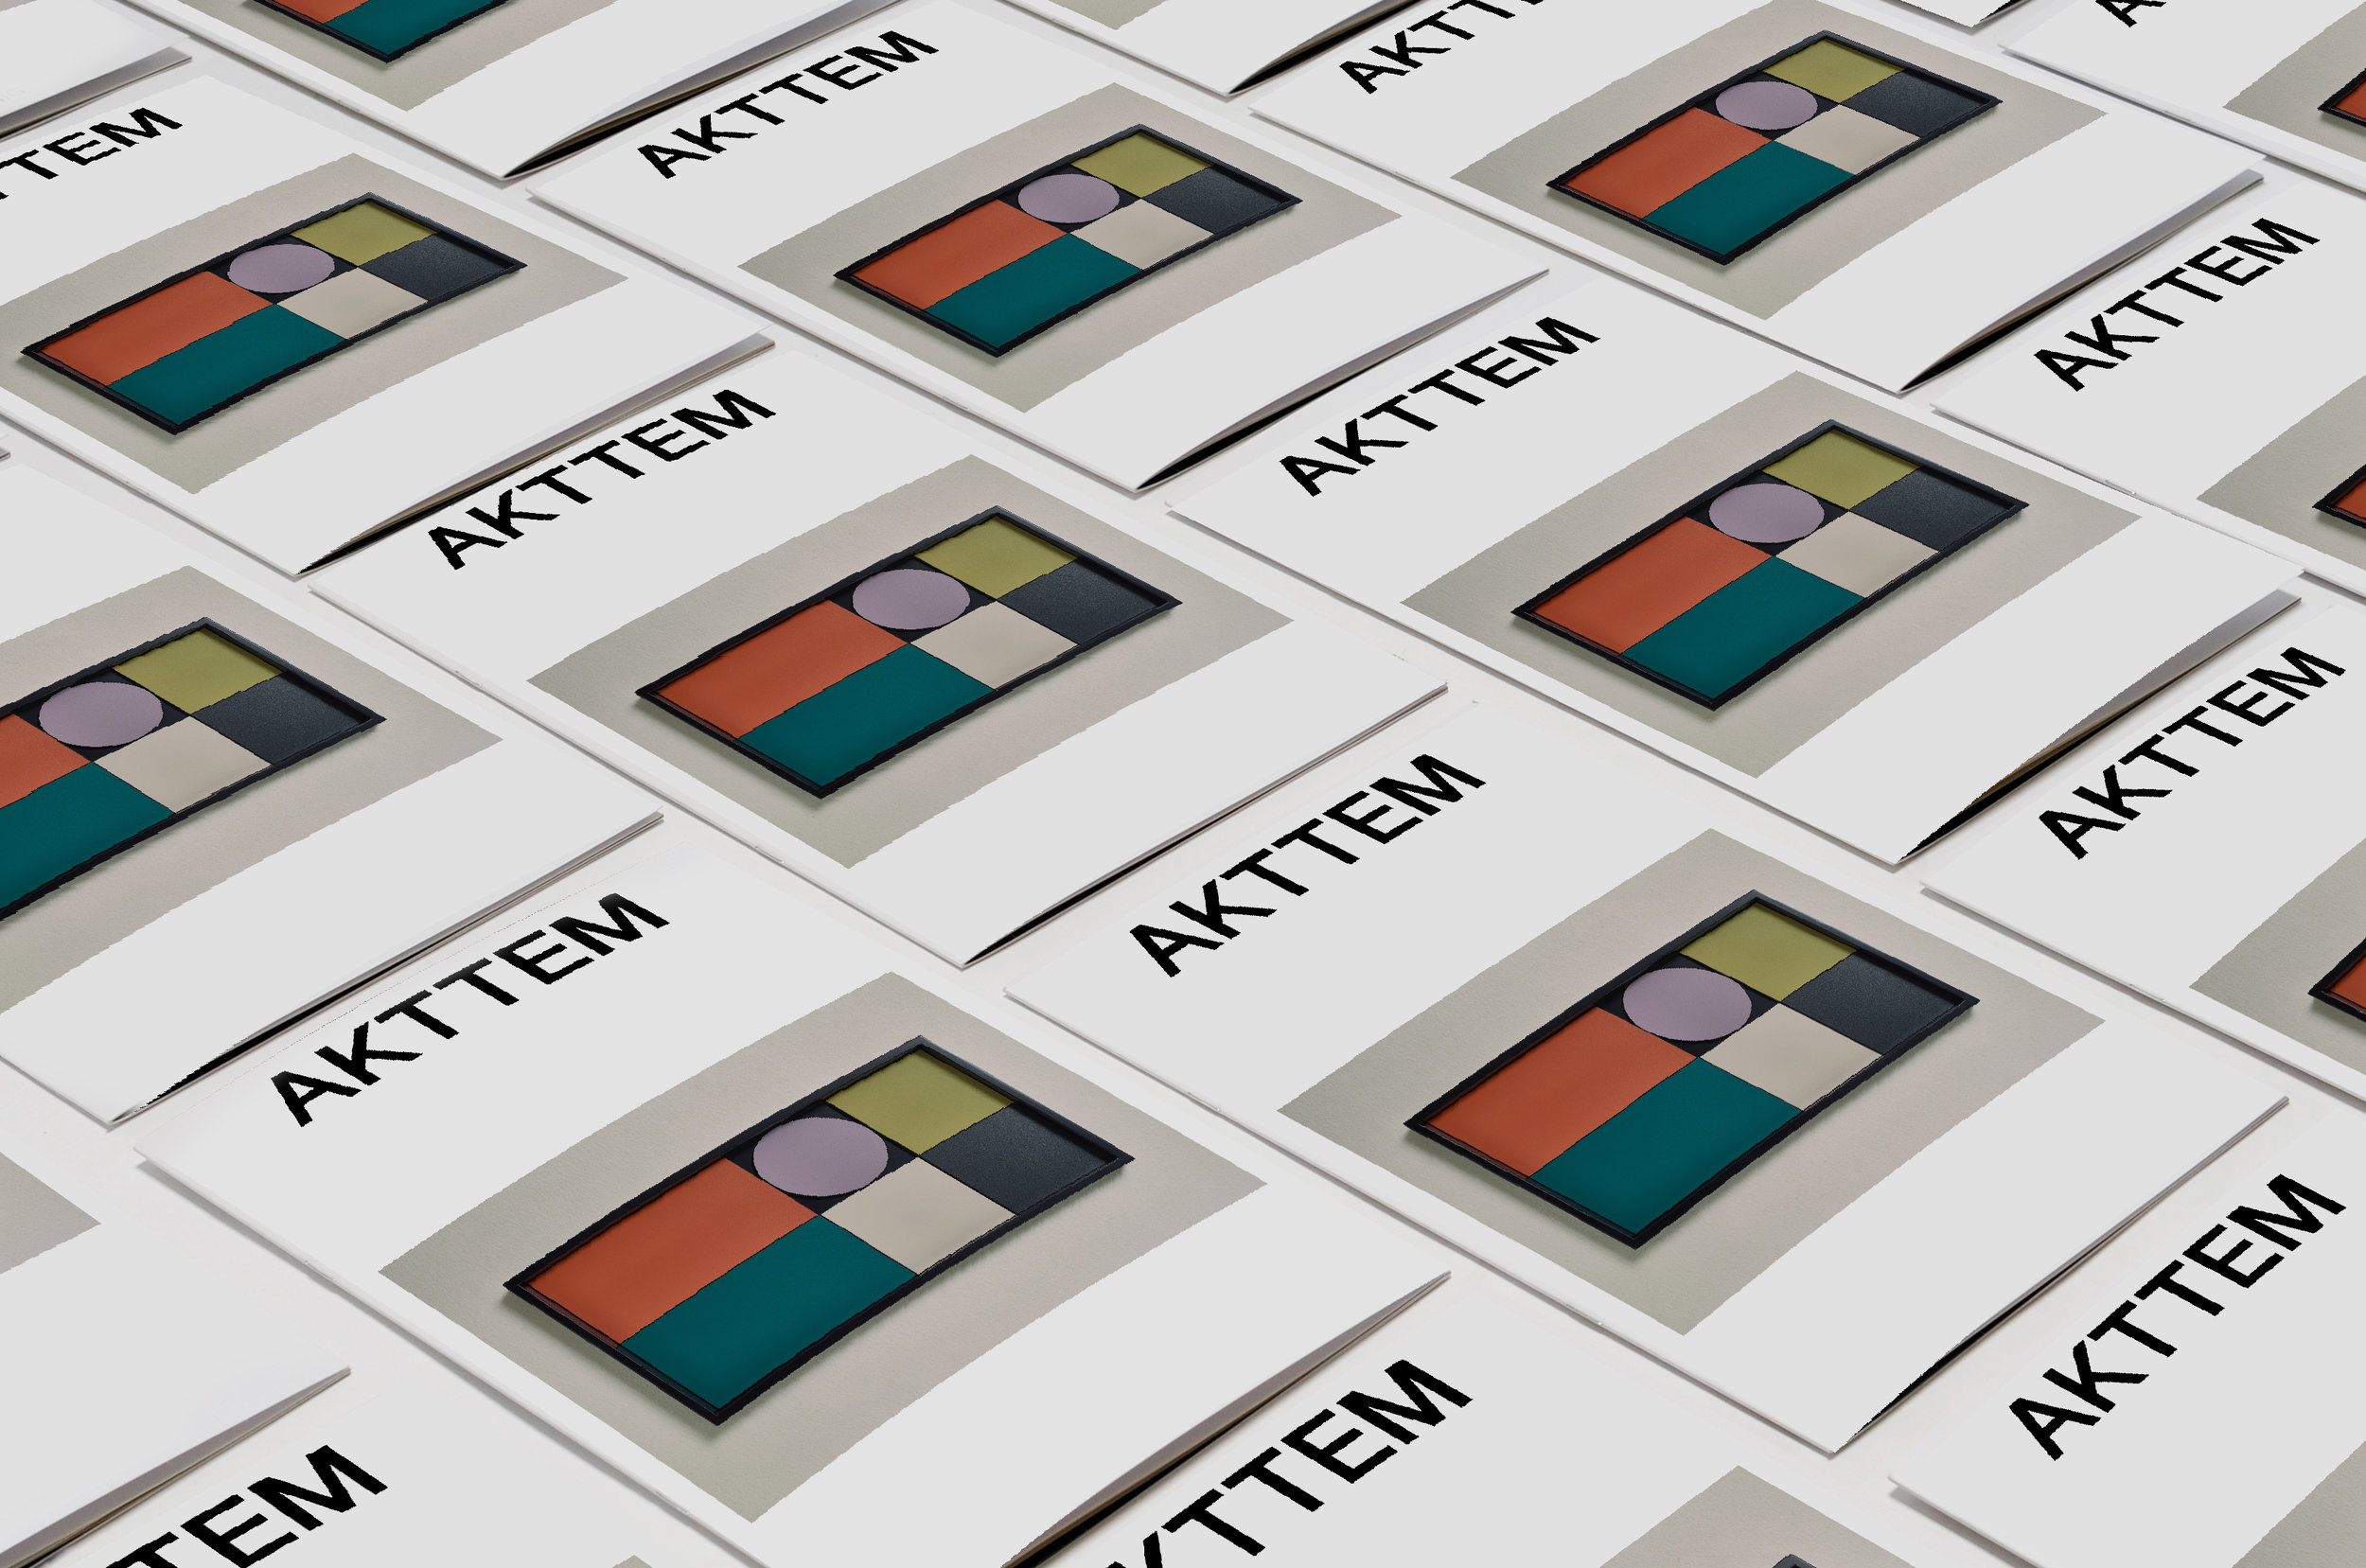 Studio-Verena-Hennig-AKTTEM-Catalogue-2019-2.jpg